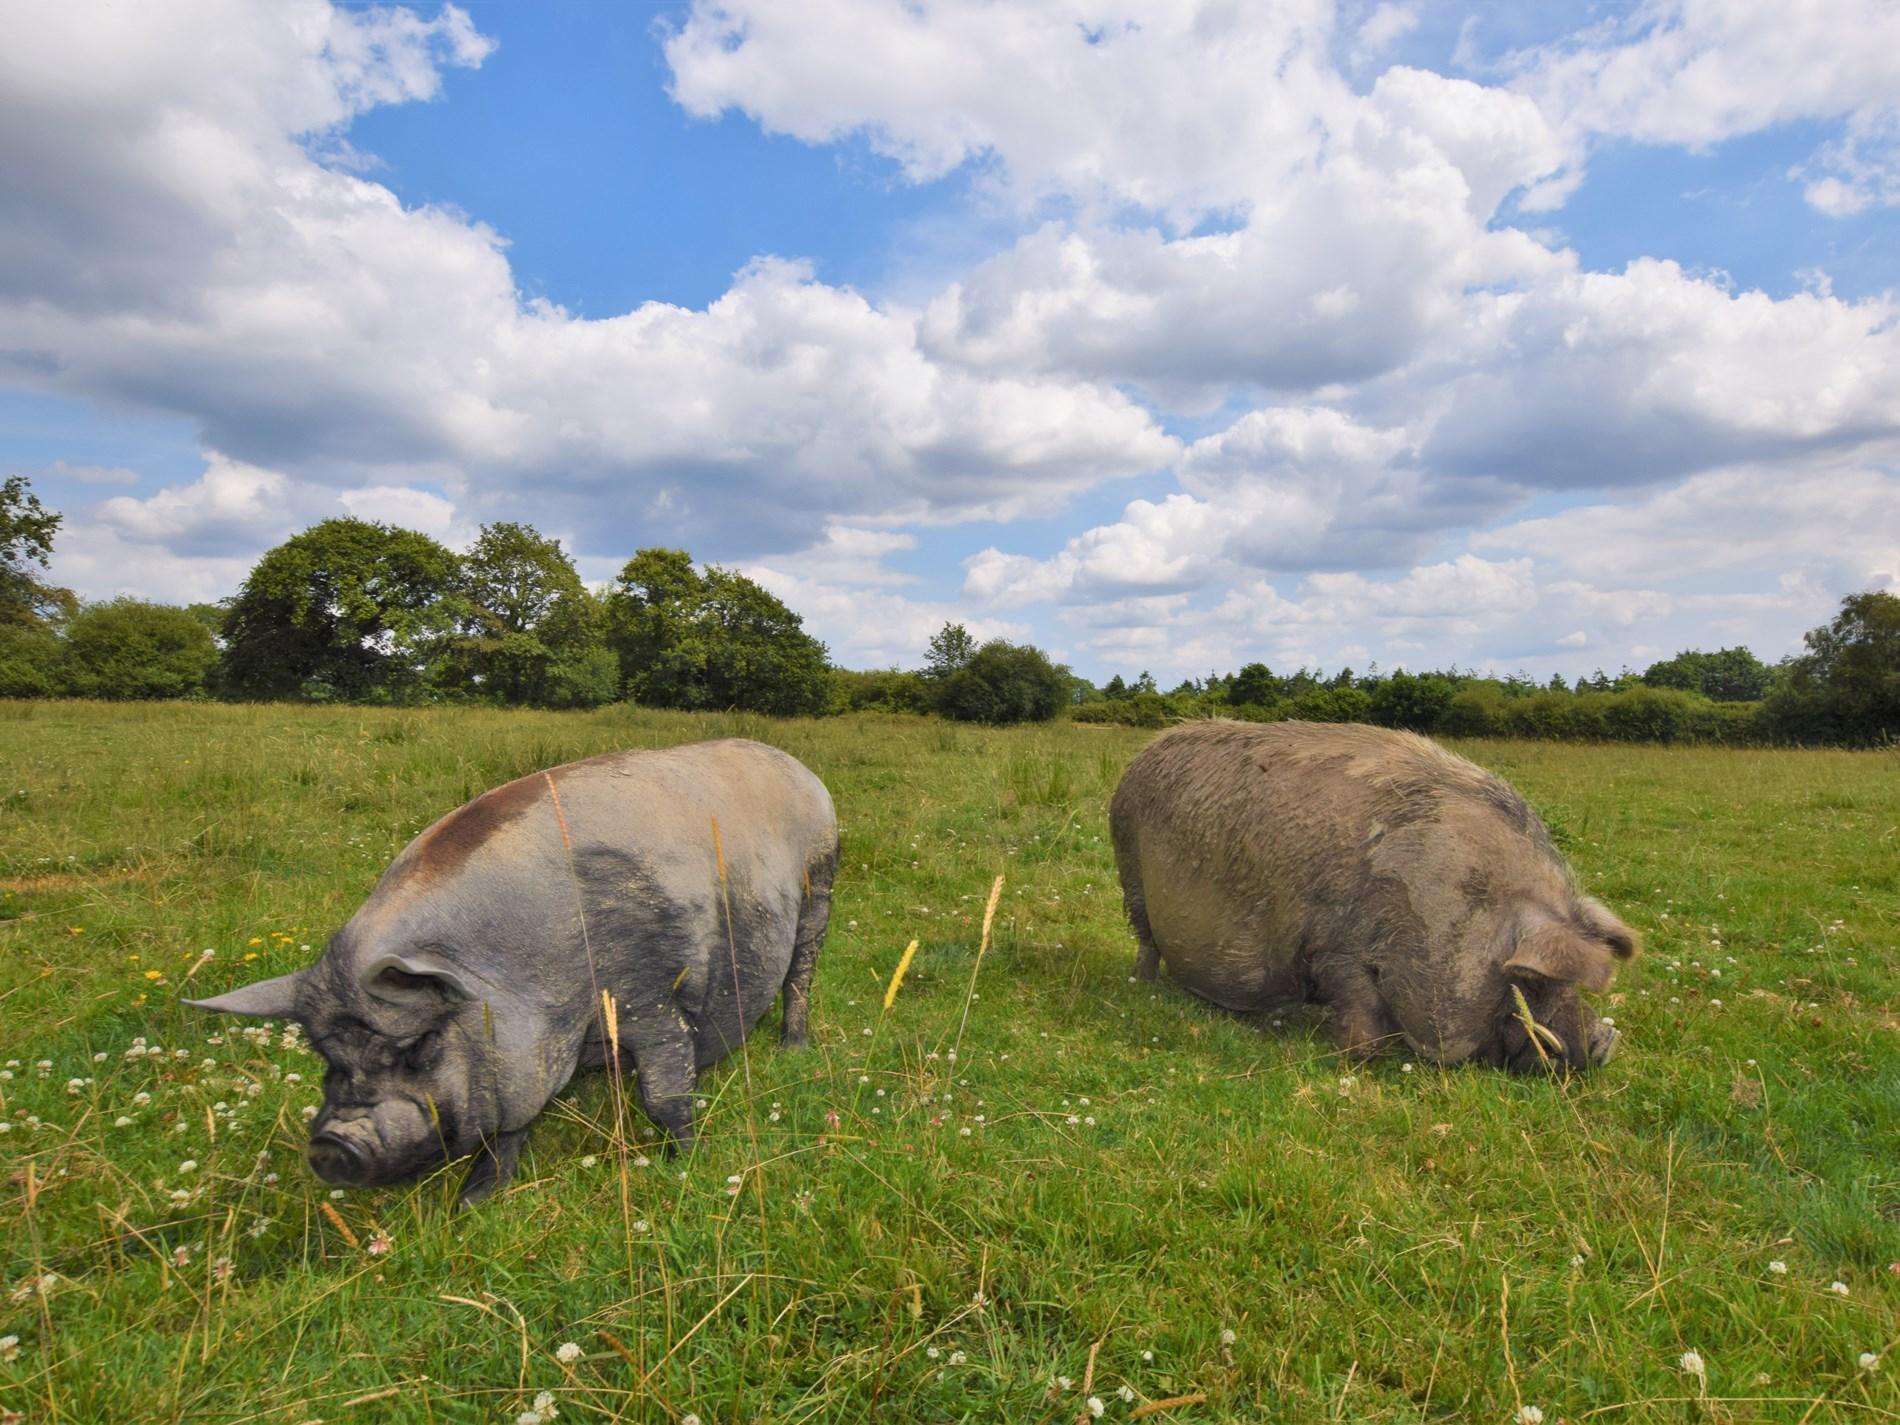 Introducing Posh & Becks, the resident pigs